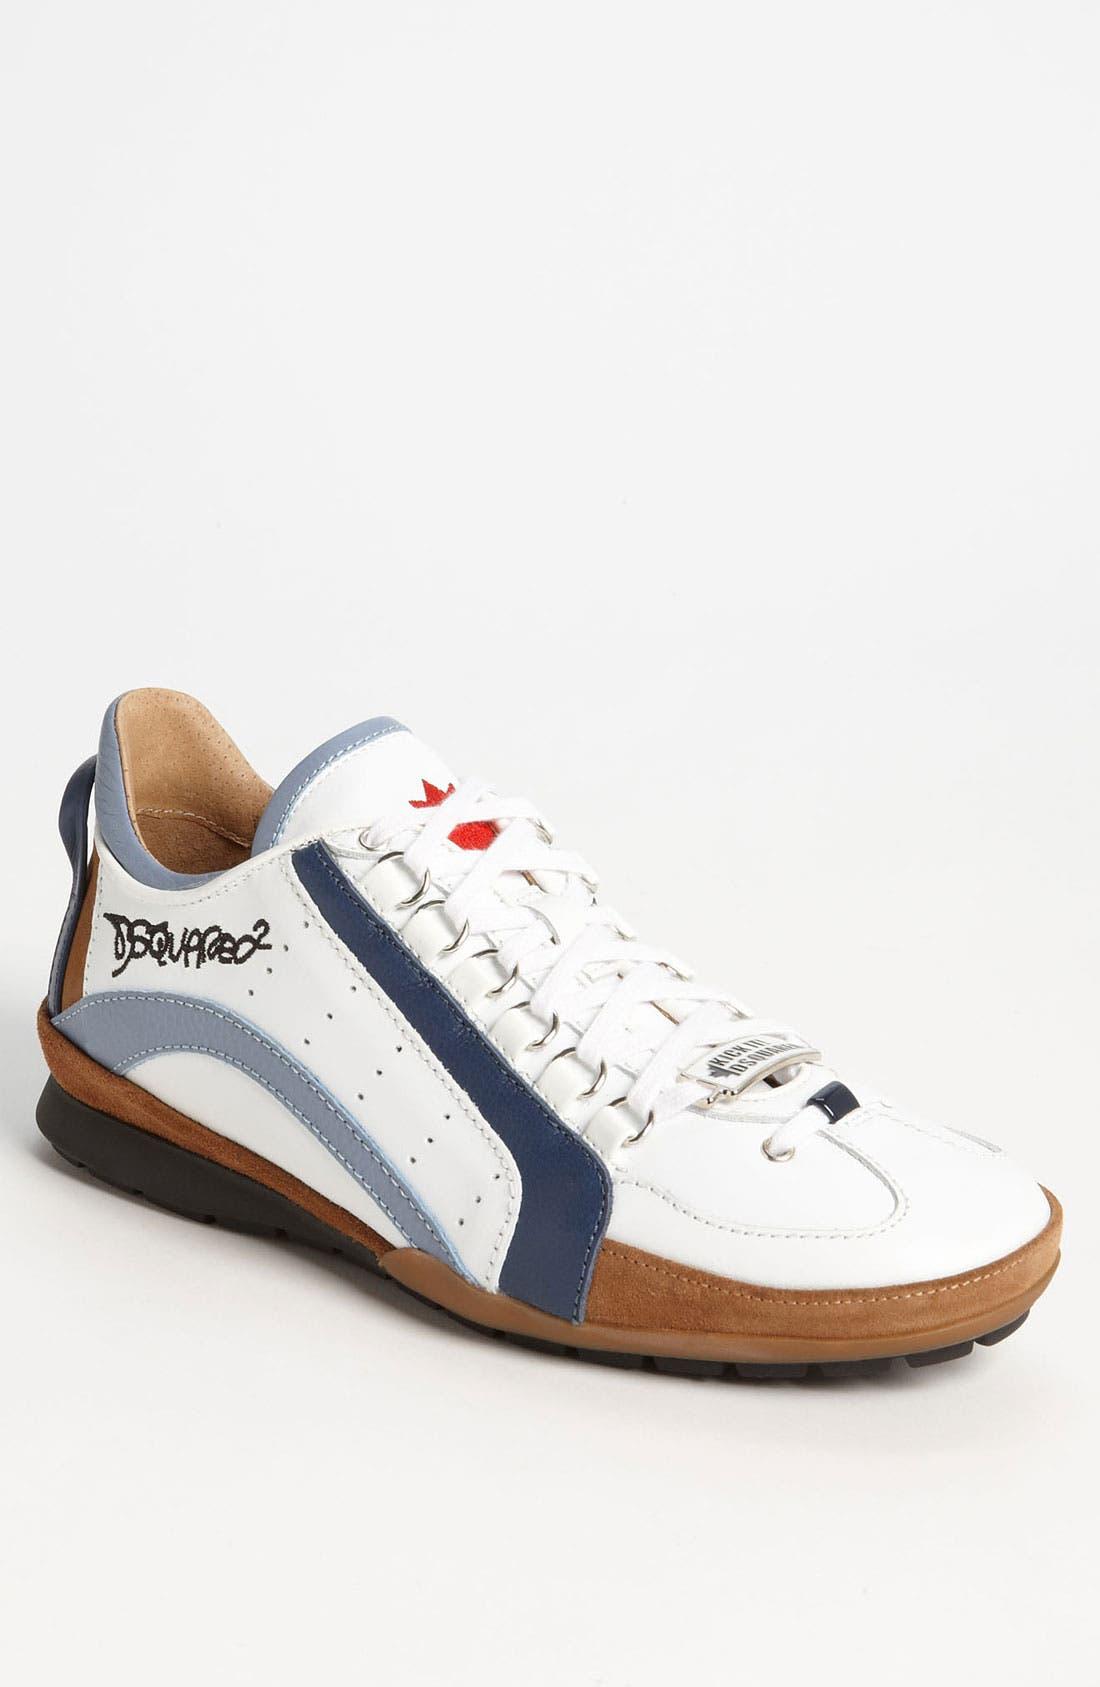 Alternate Image 1 Selected - Dsquared2 '551 Sport' Sneaker